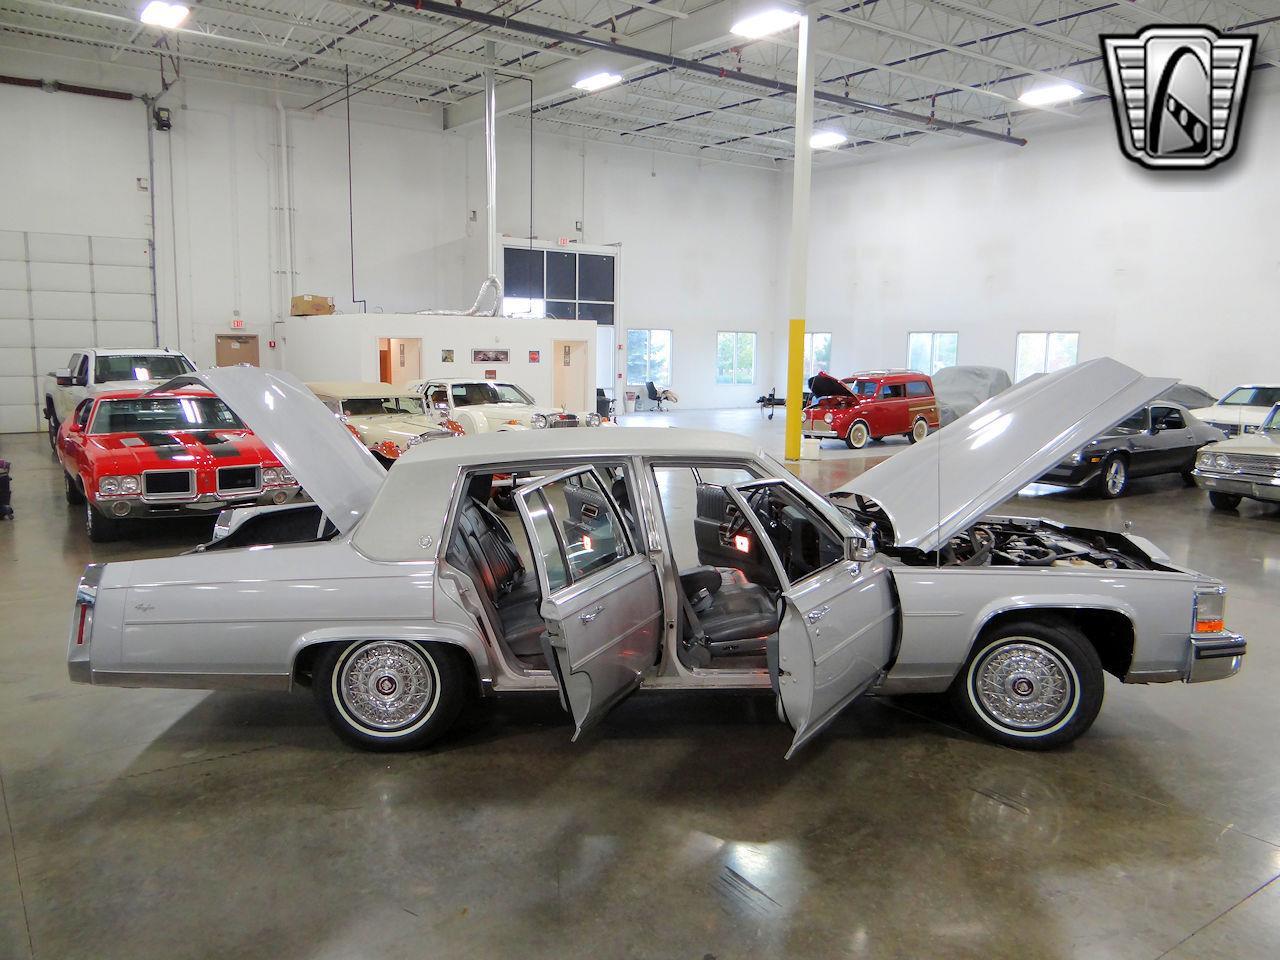 1988 Cadillac Brougham (CC-1340847) for sale in O'Fallon, Illinois